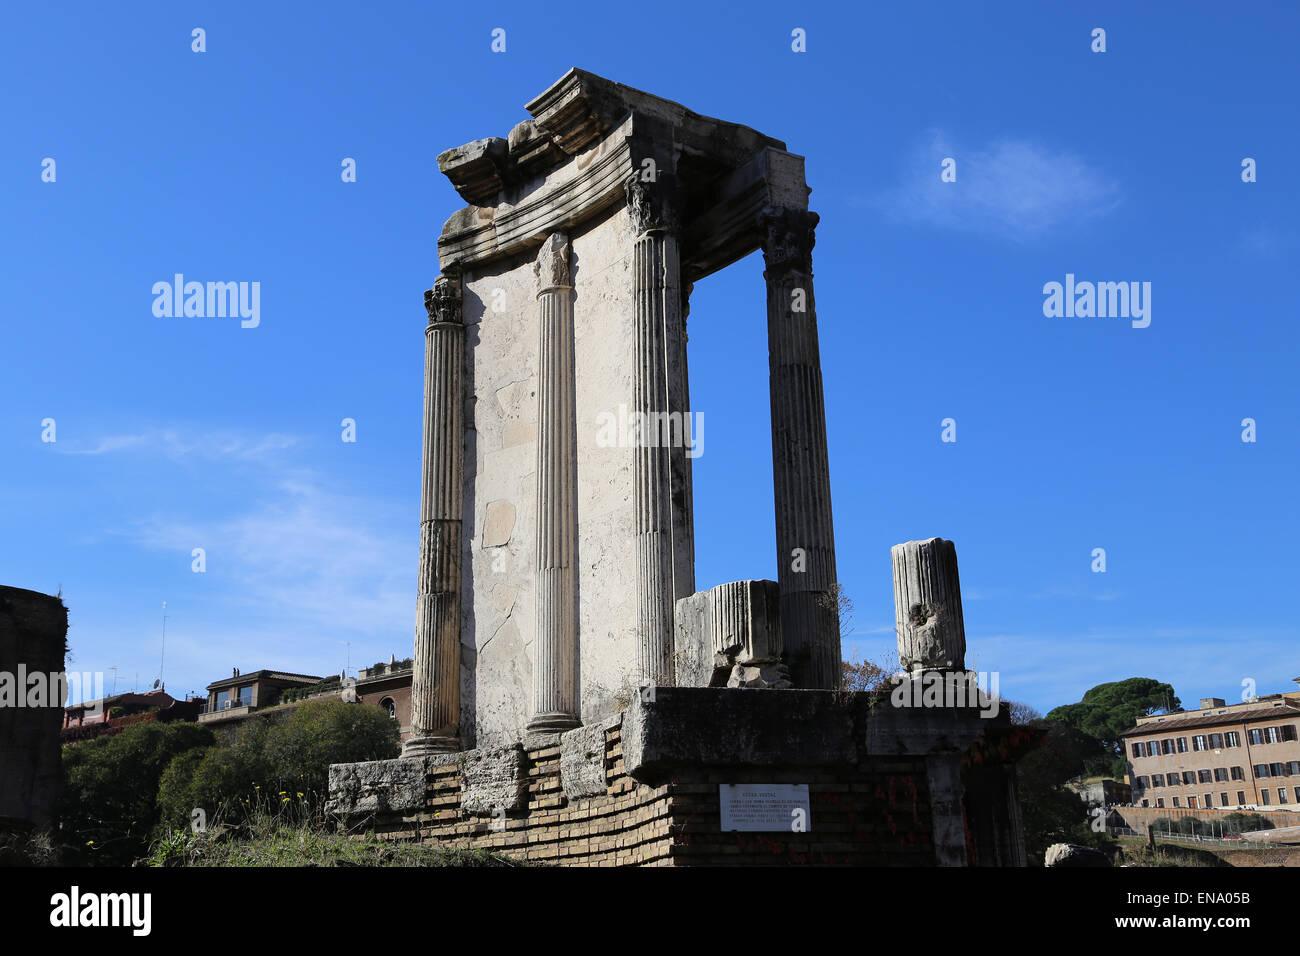 Italy. Rome. Roman Forum. Temple of Vesta. Roman Old Kingdom. - Stock Image